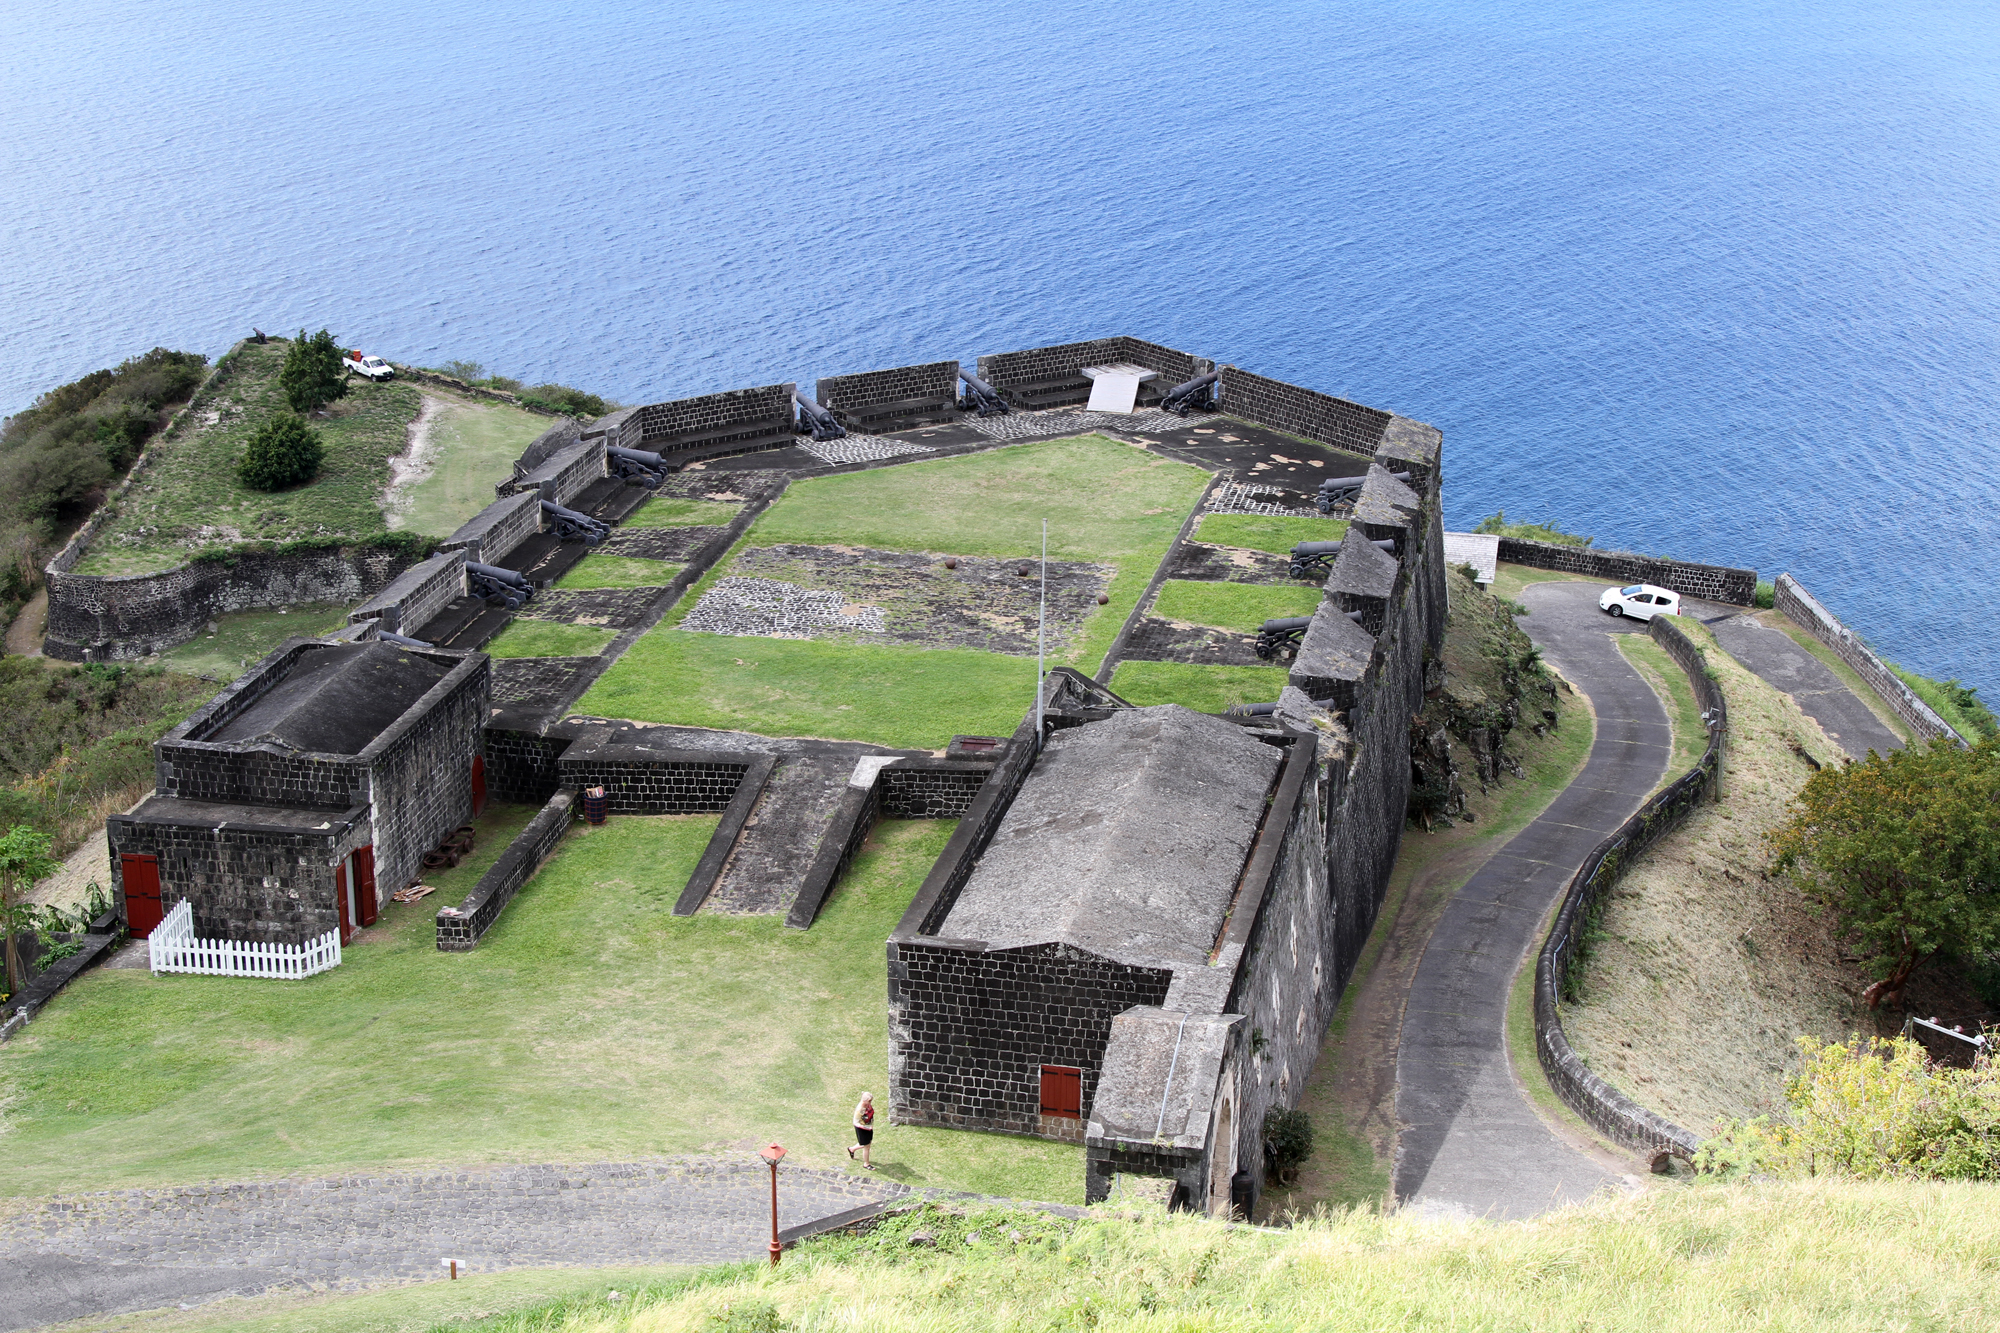 Brimstone Hill Fortress on Saint Kitts. Photo taken on February 17, 2012.